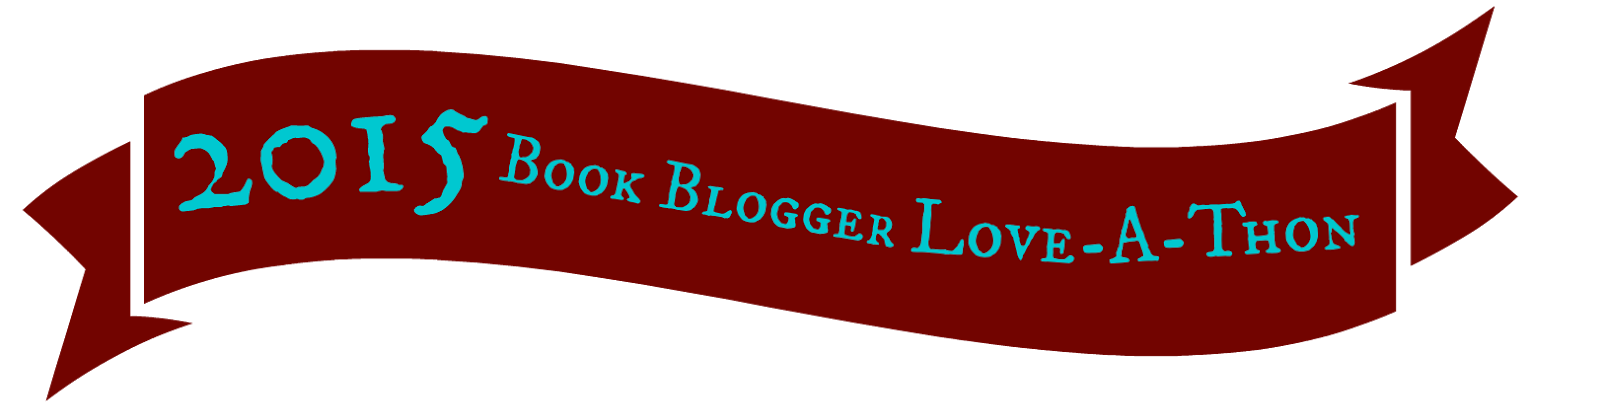 Book blogger love a. Wow clipart vivacious